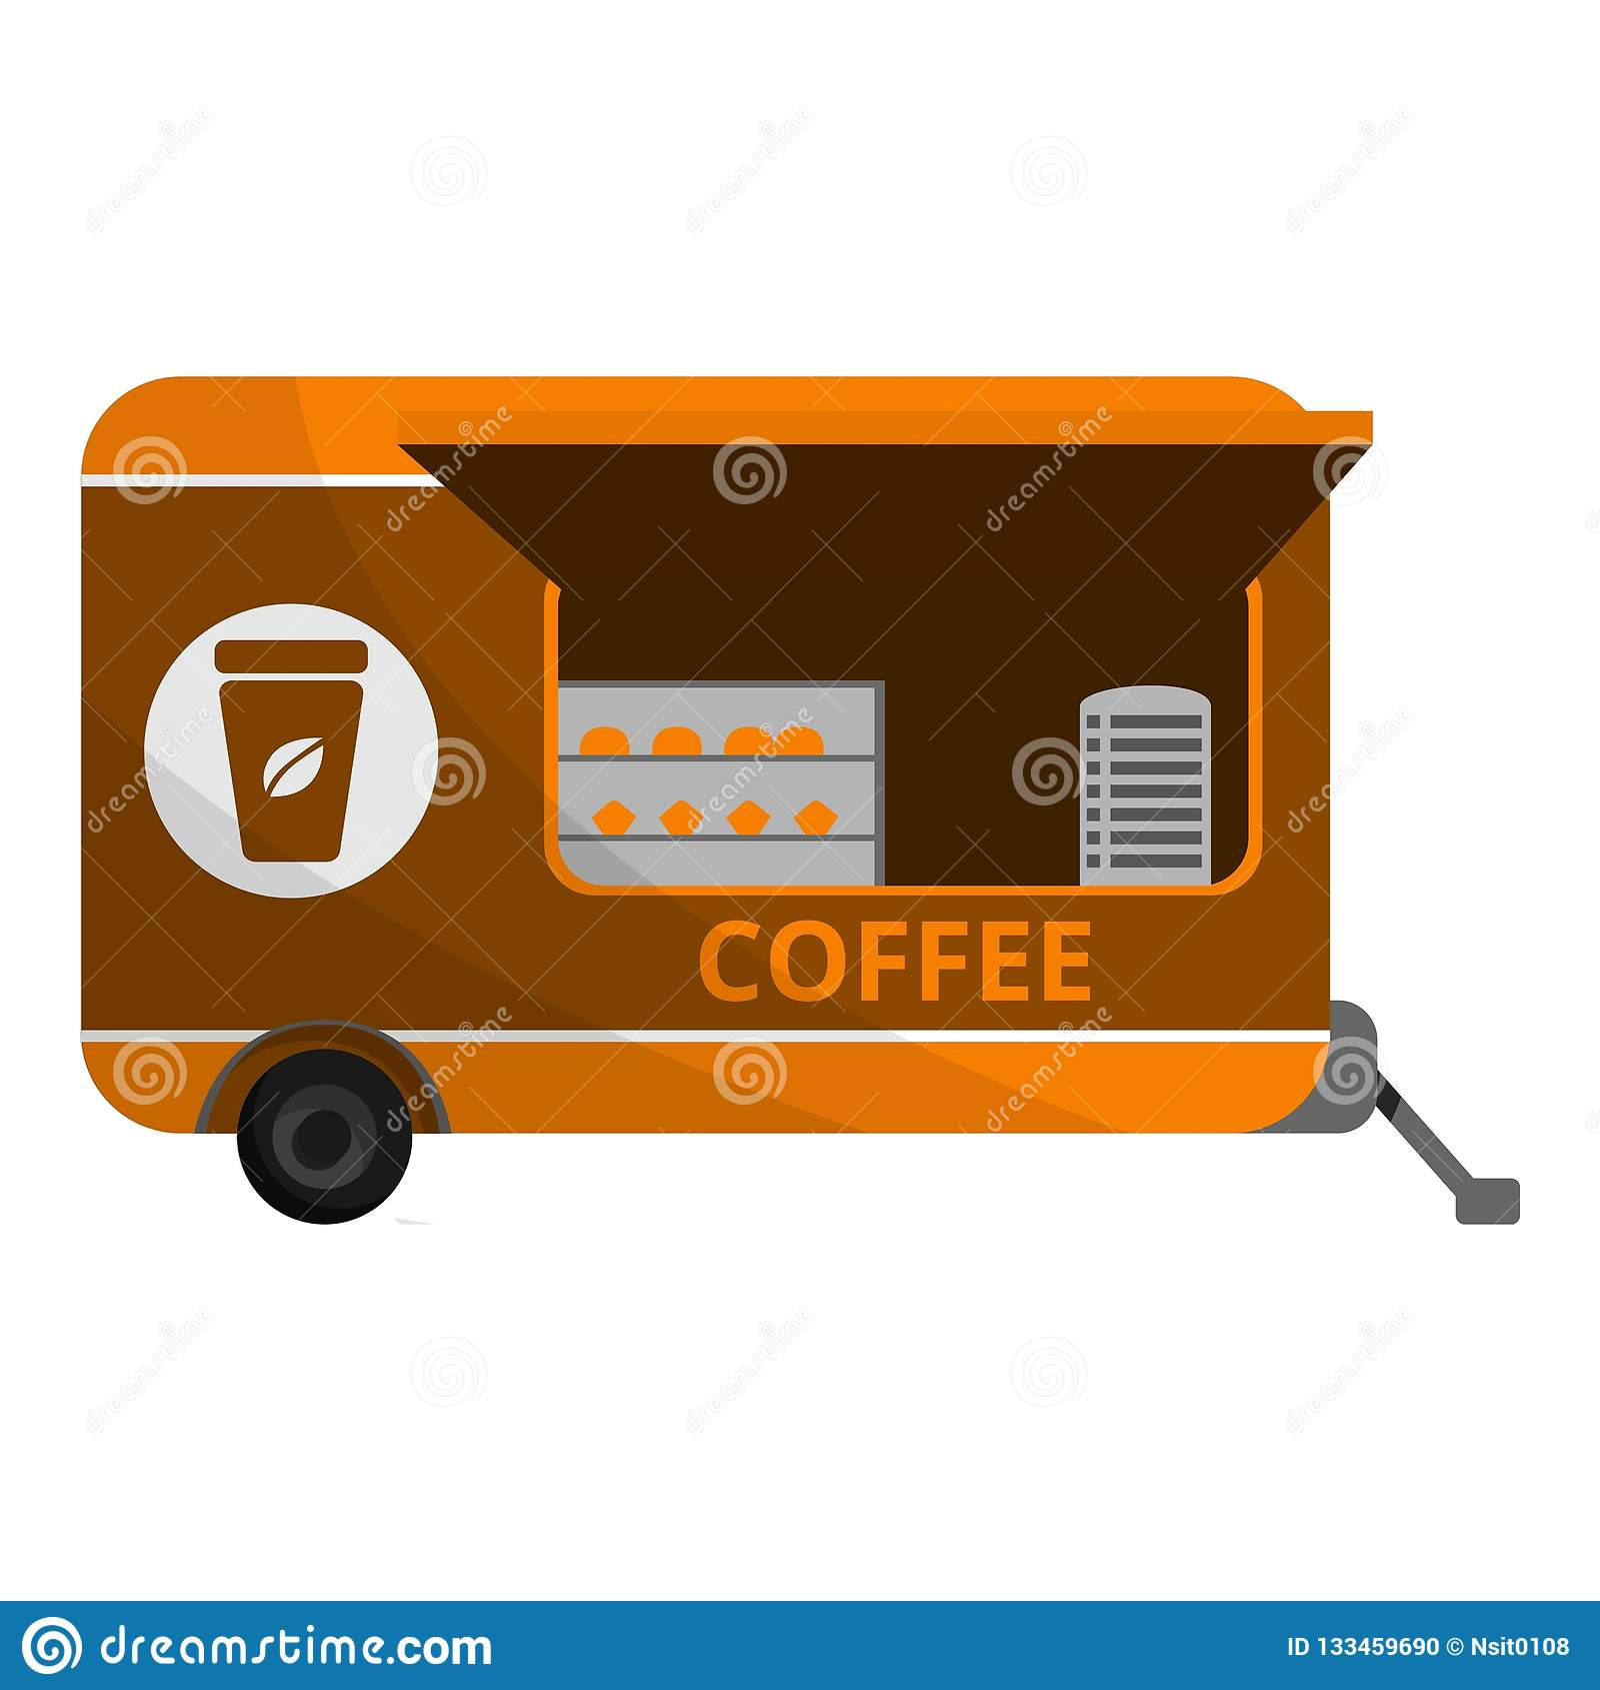 Icône de remorque de café, style de bande dessinée